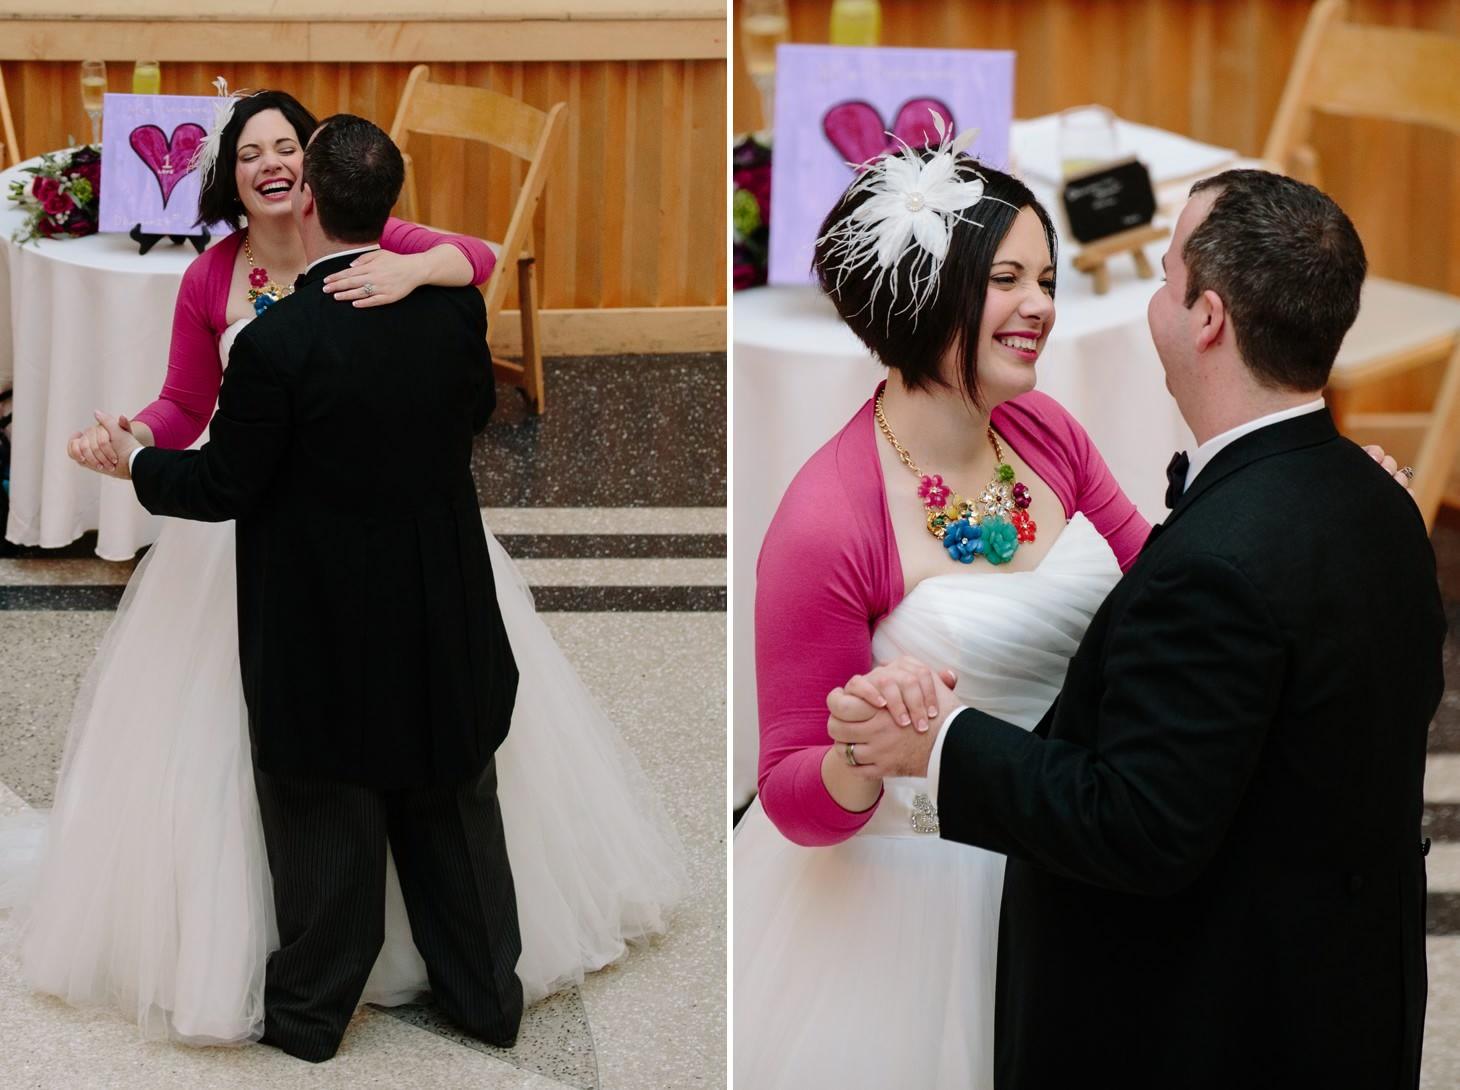 052-nyc-wedding-photographer-smitten-chickens-nj-montclair-art-museum.jpg